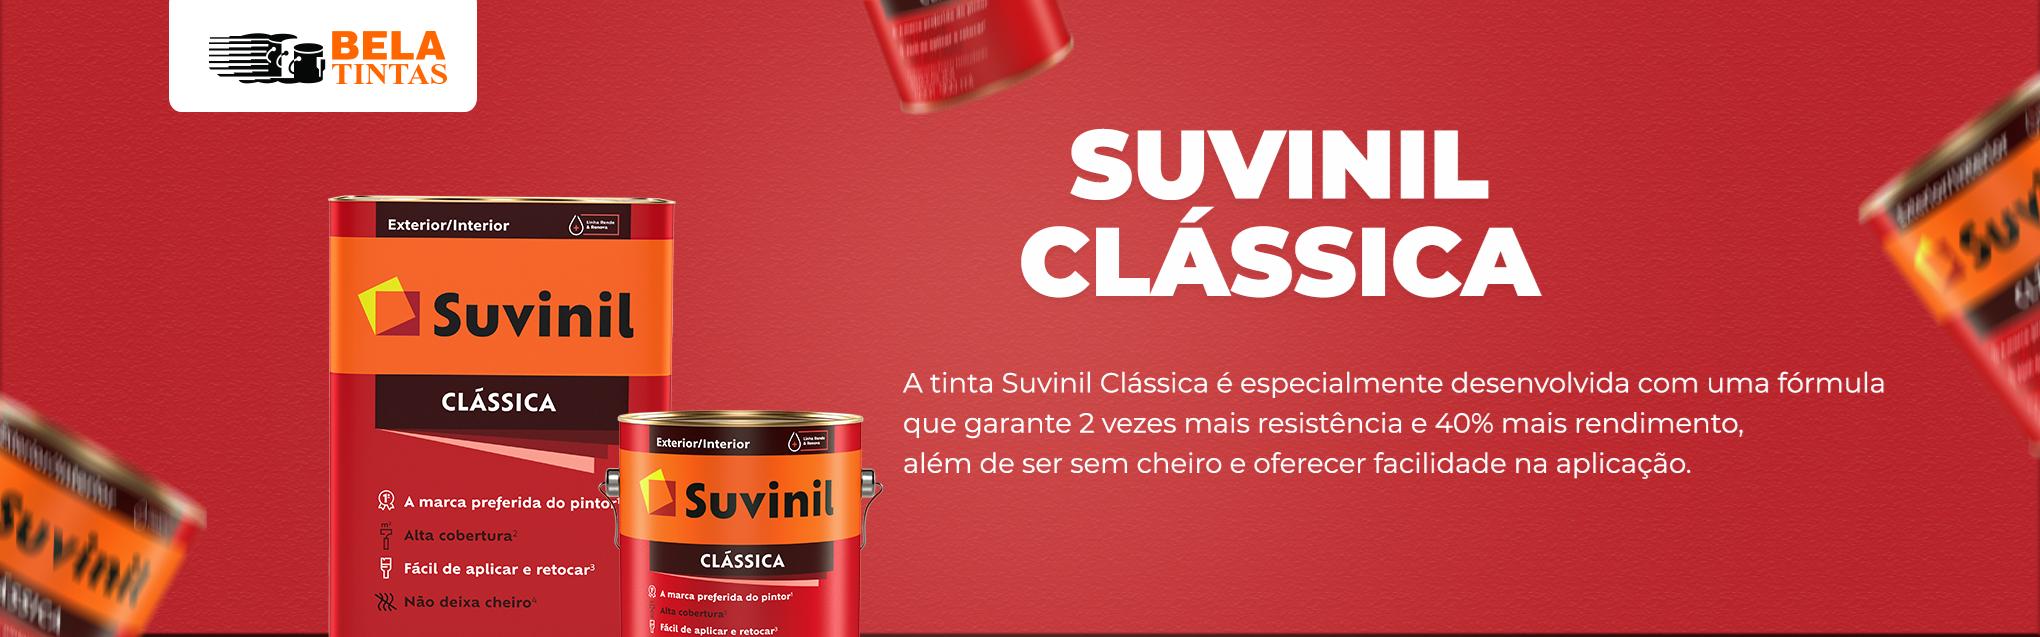 https://www.belatintas.com.br/busca?busca=suvinil+classica&pagina=1